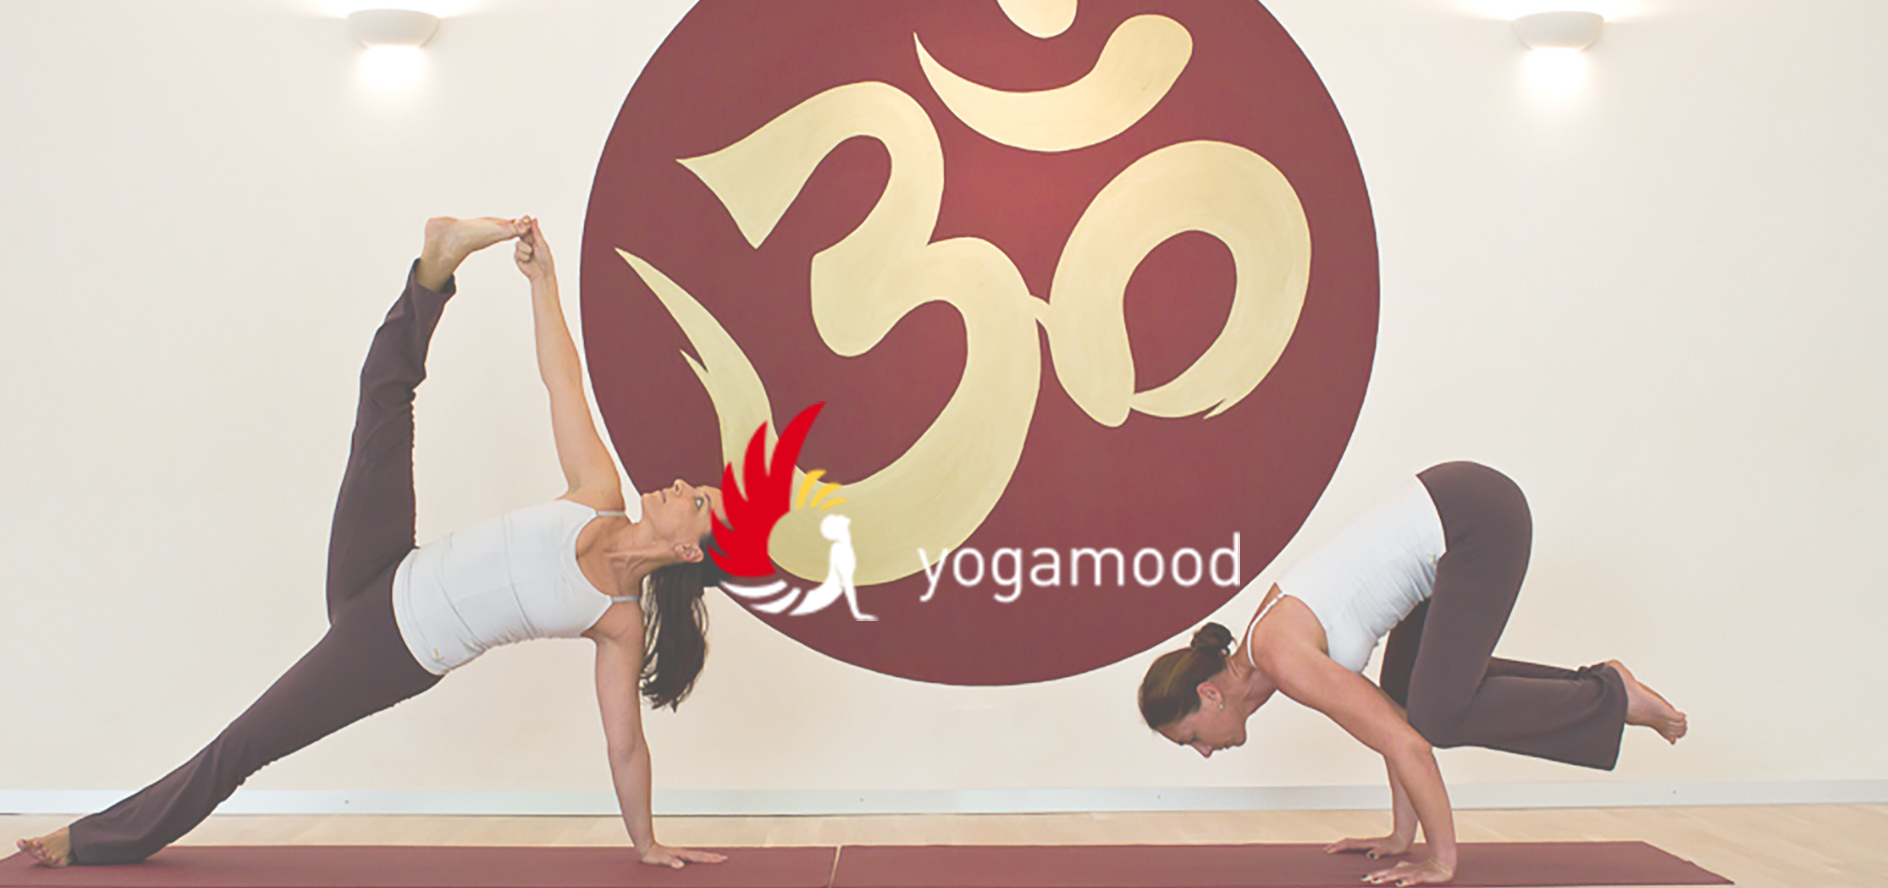 Yogamood Innsbruck